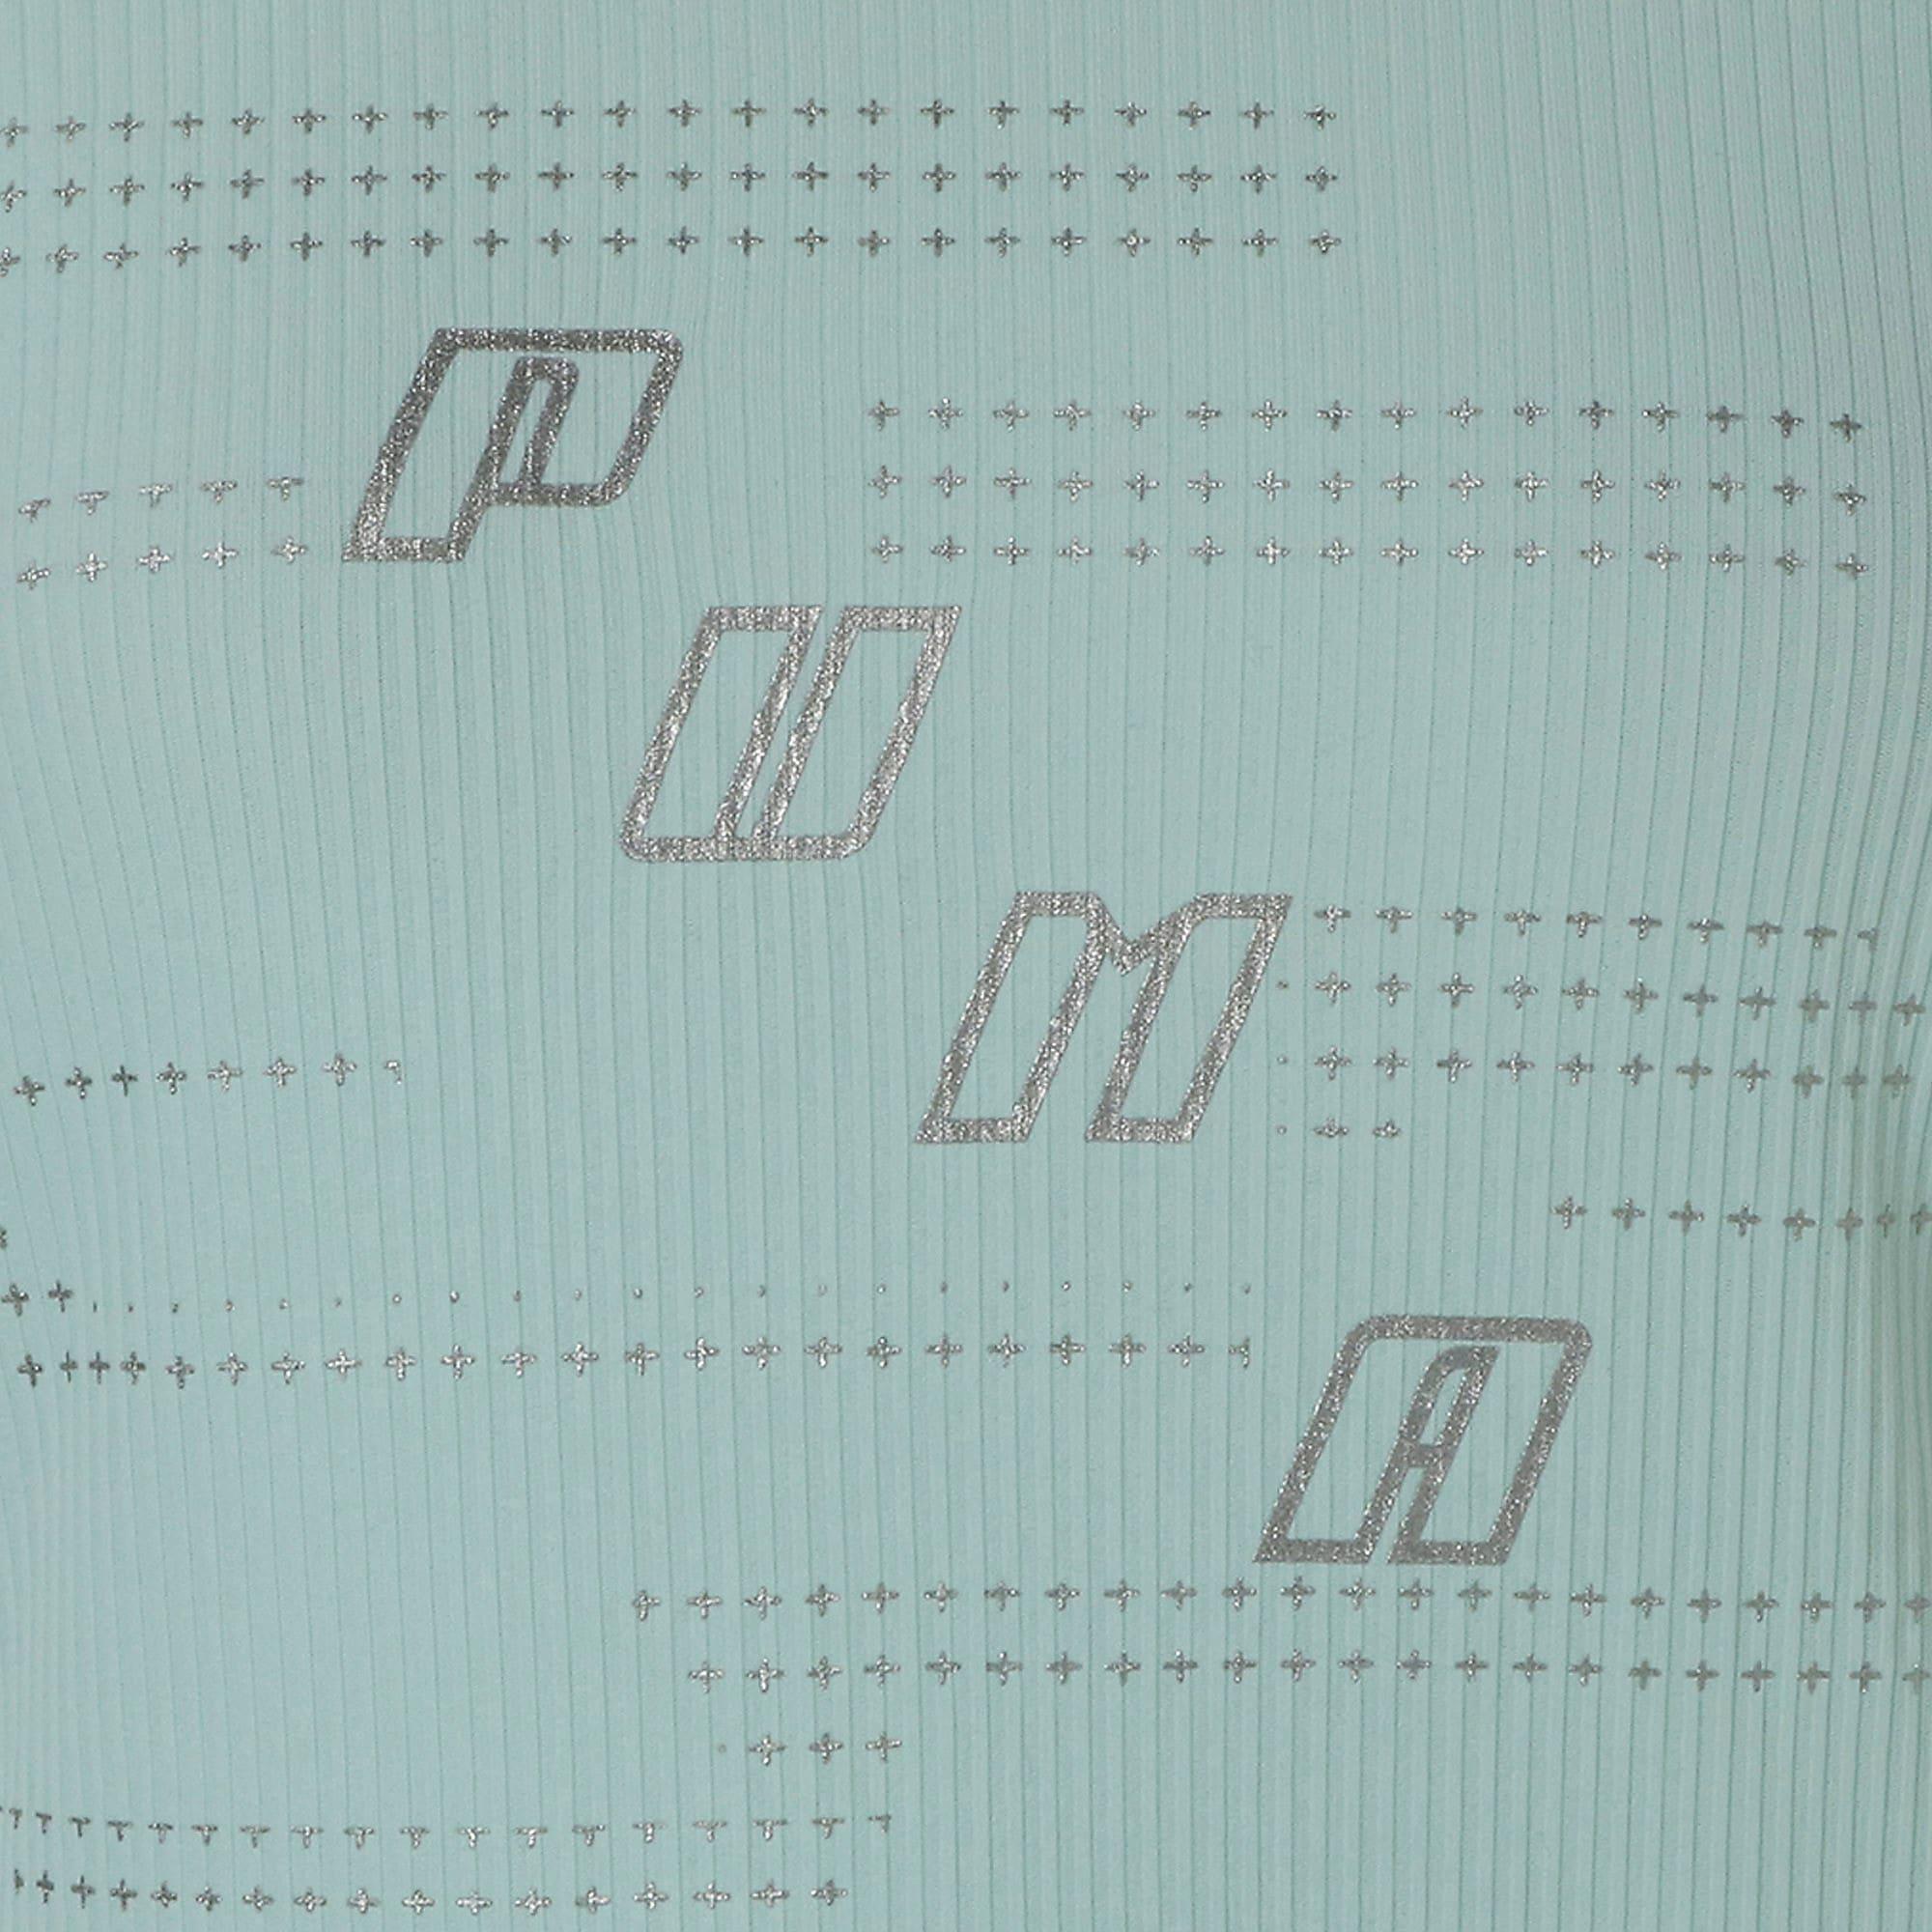 Thumbnail 9 of イグナイト SS ロゴ ウィメンズ Tシャツ 半袖, Fair Aqua, medium-JPN